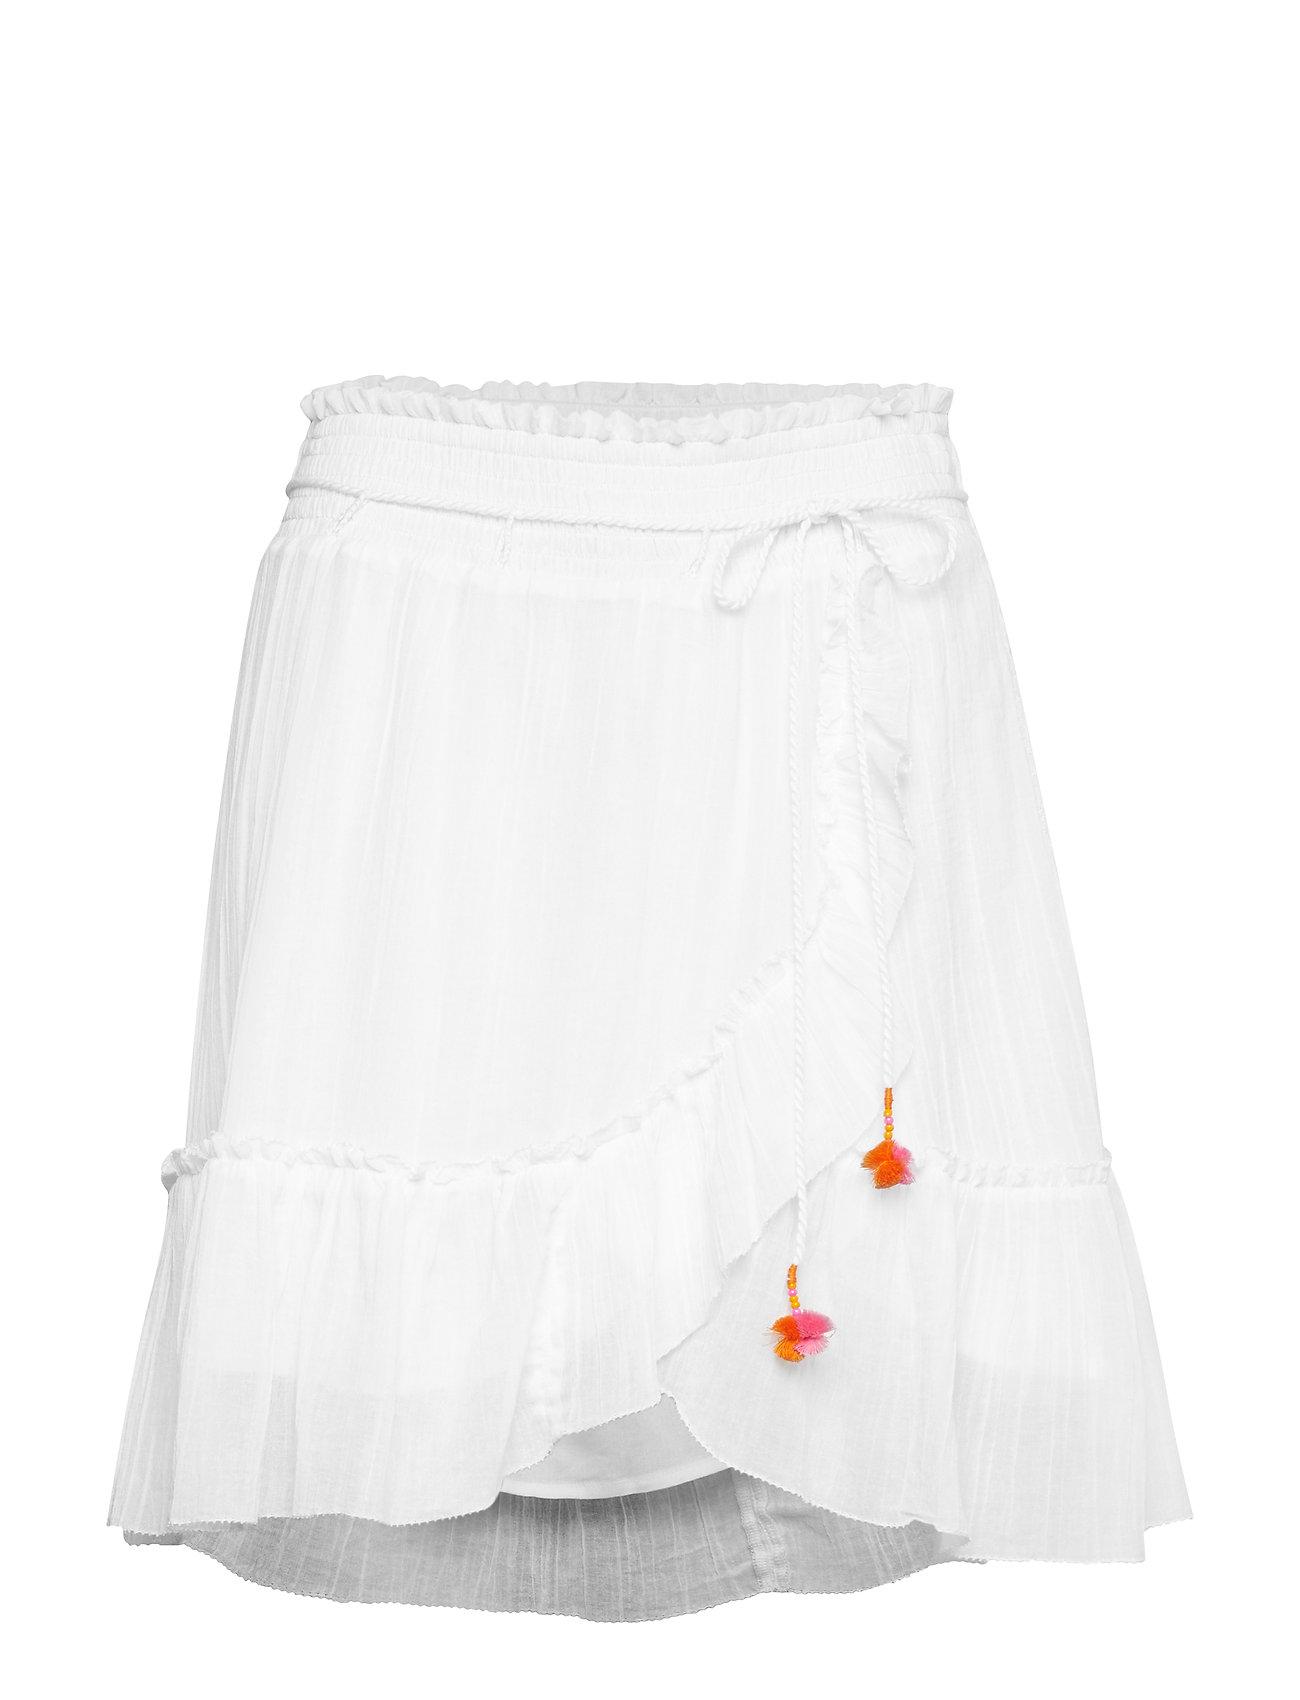 ODD MOLLY superflow skirt - BRIGHT WHITE